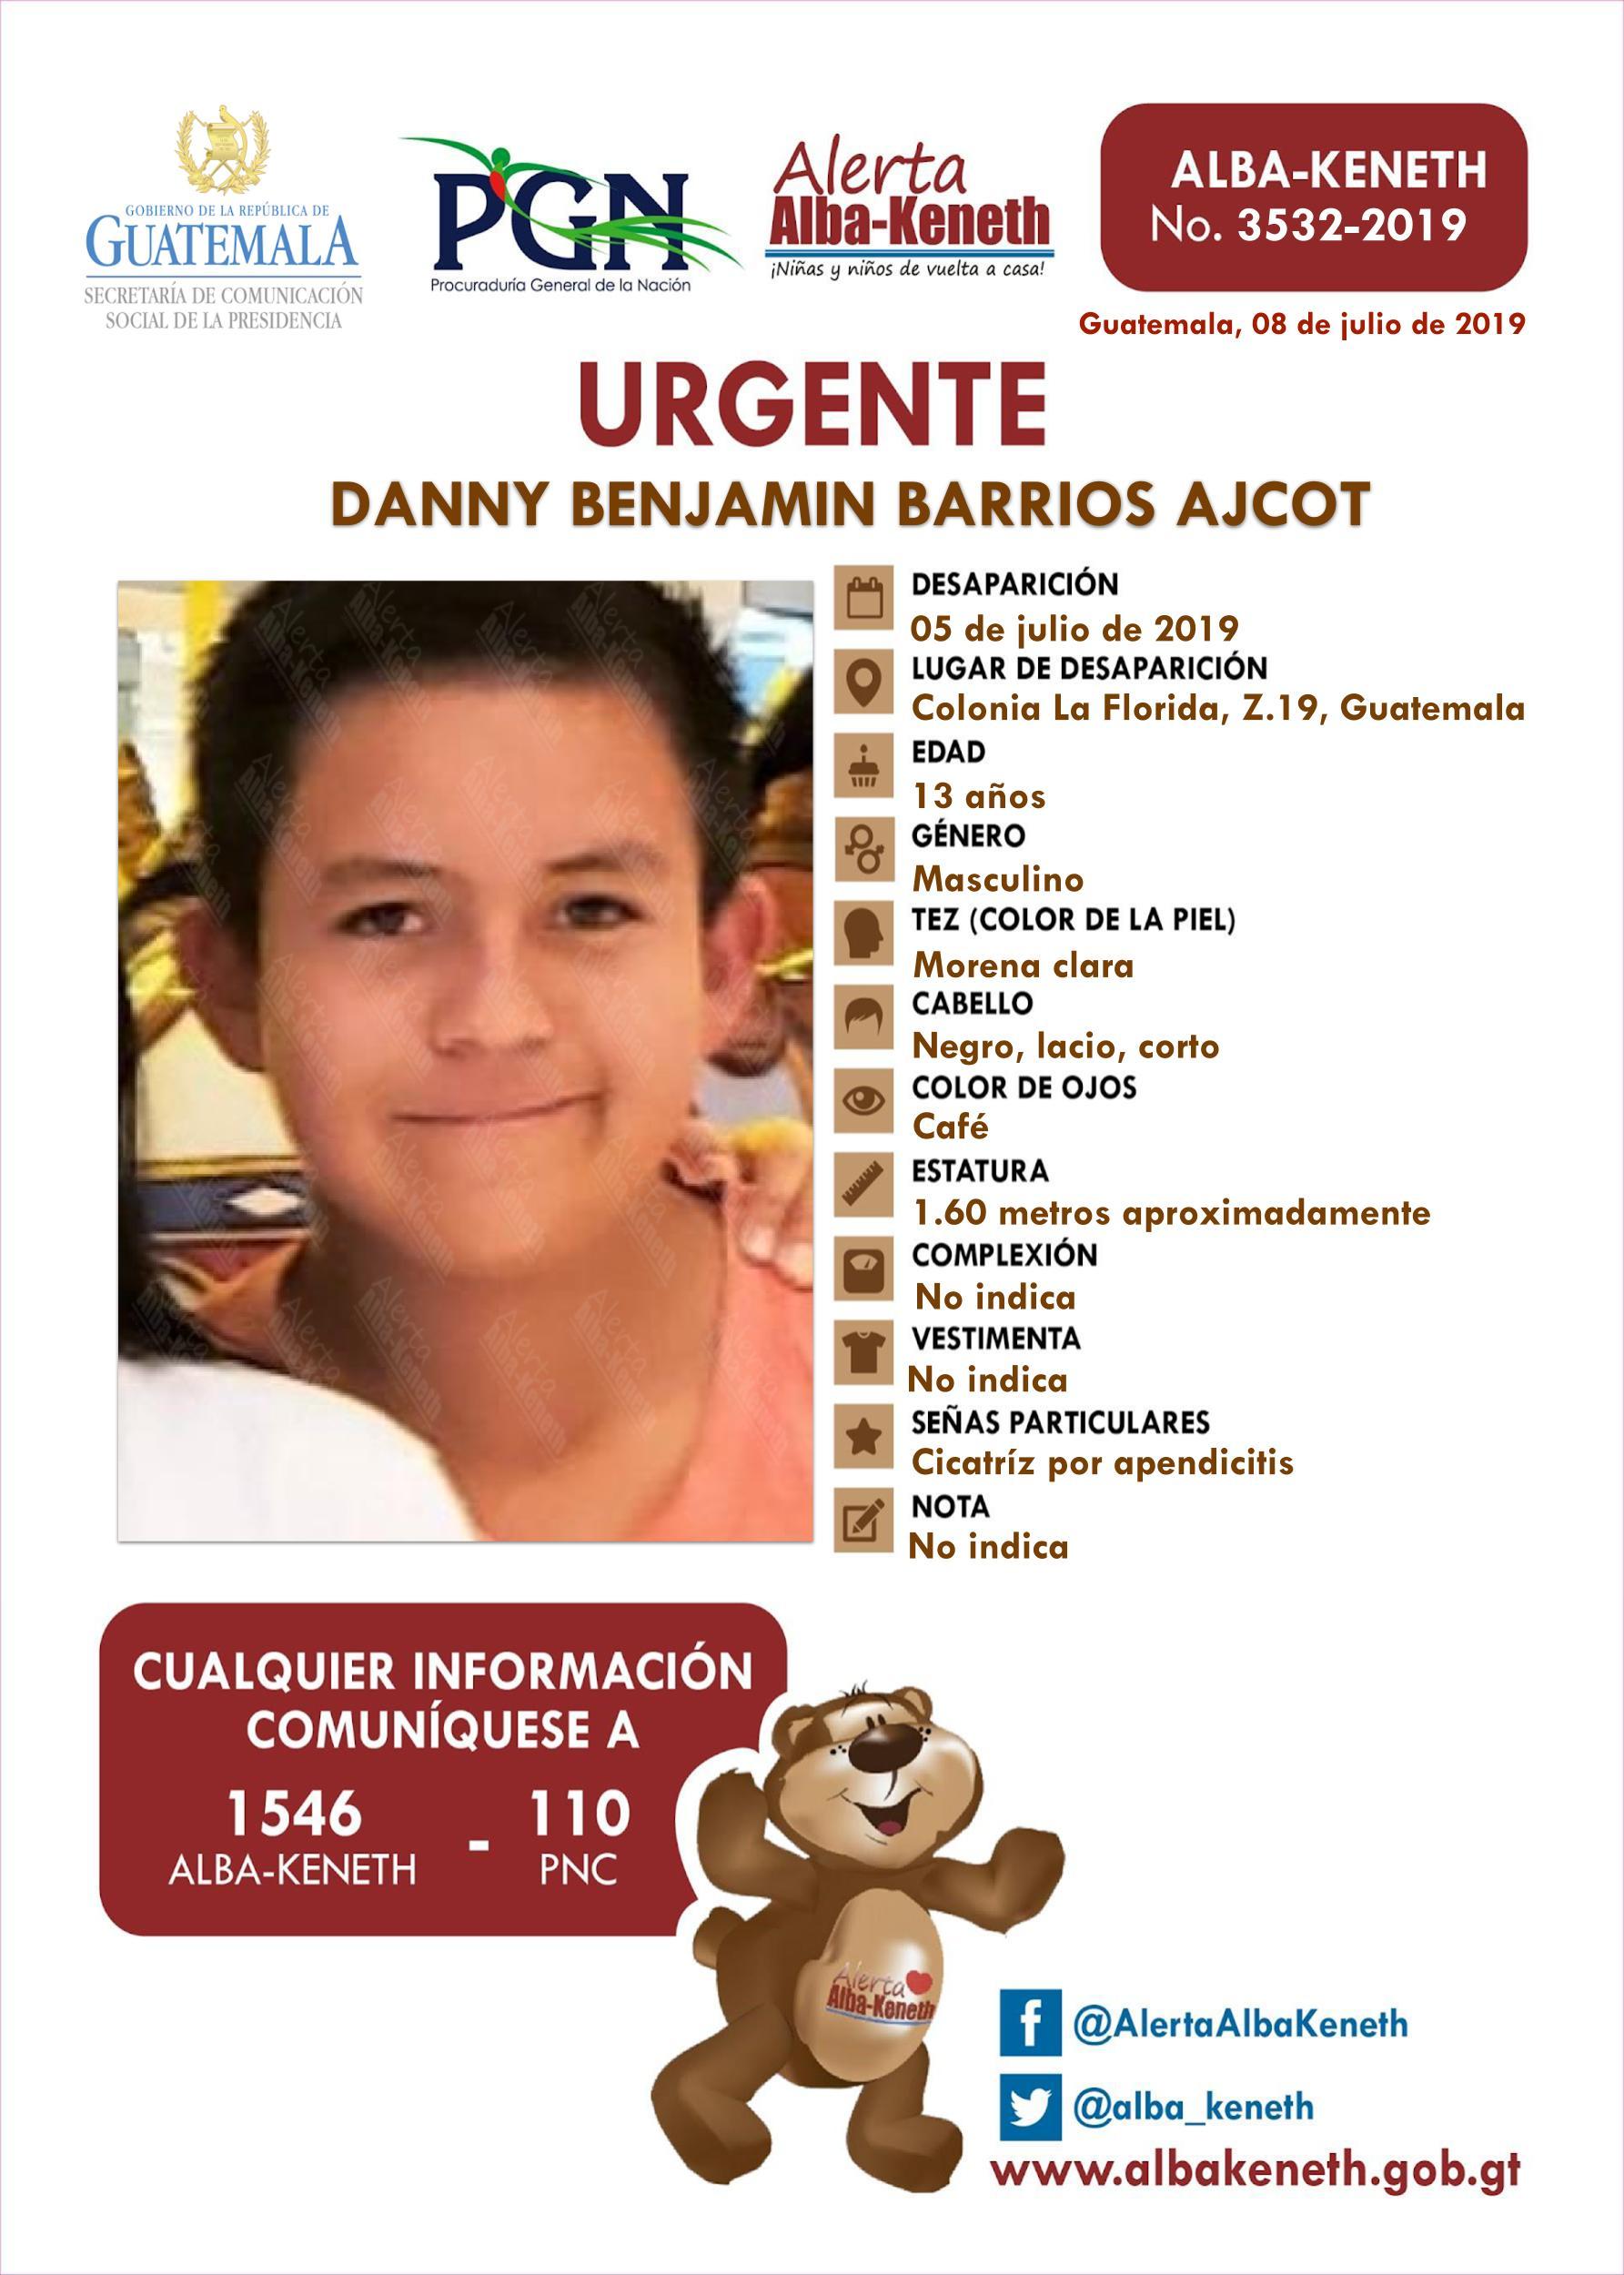 Danny Benjamin Barrios Ajcot